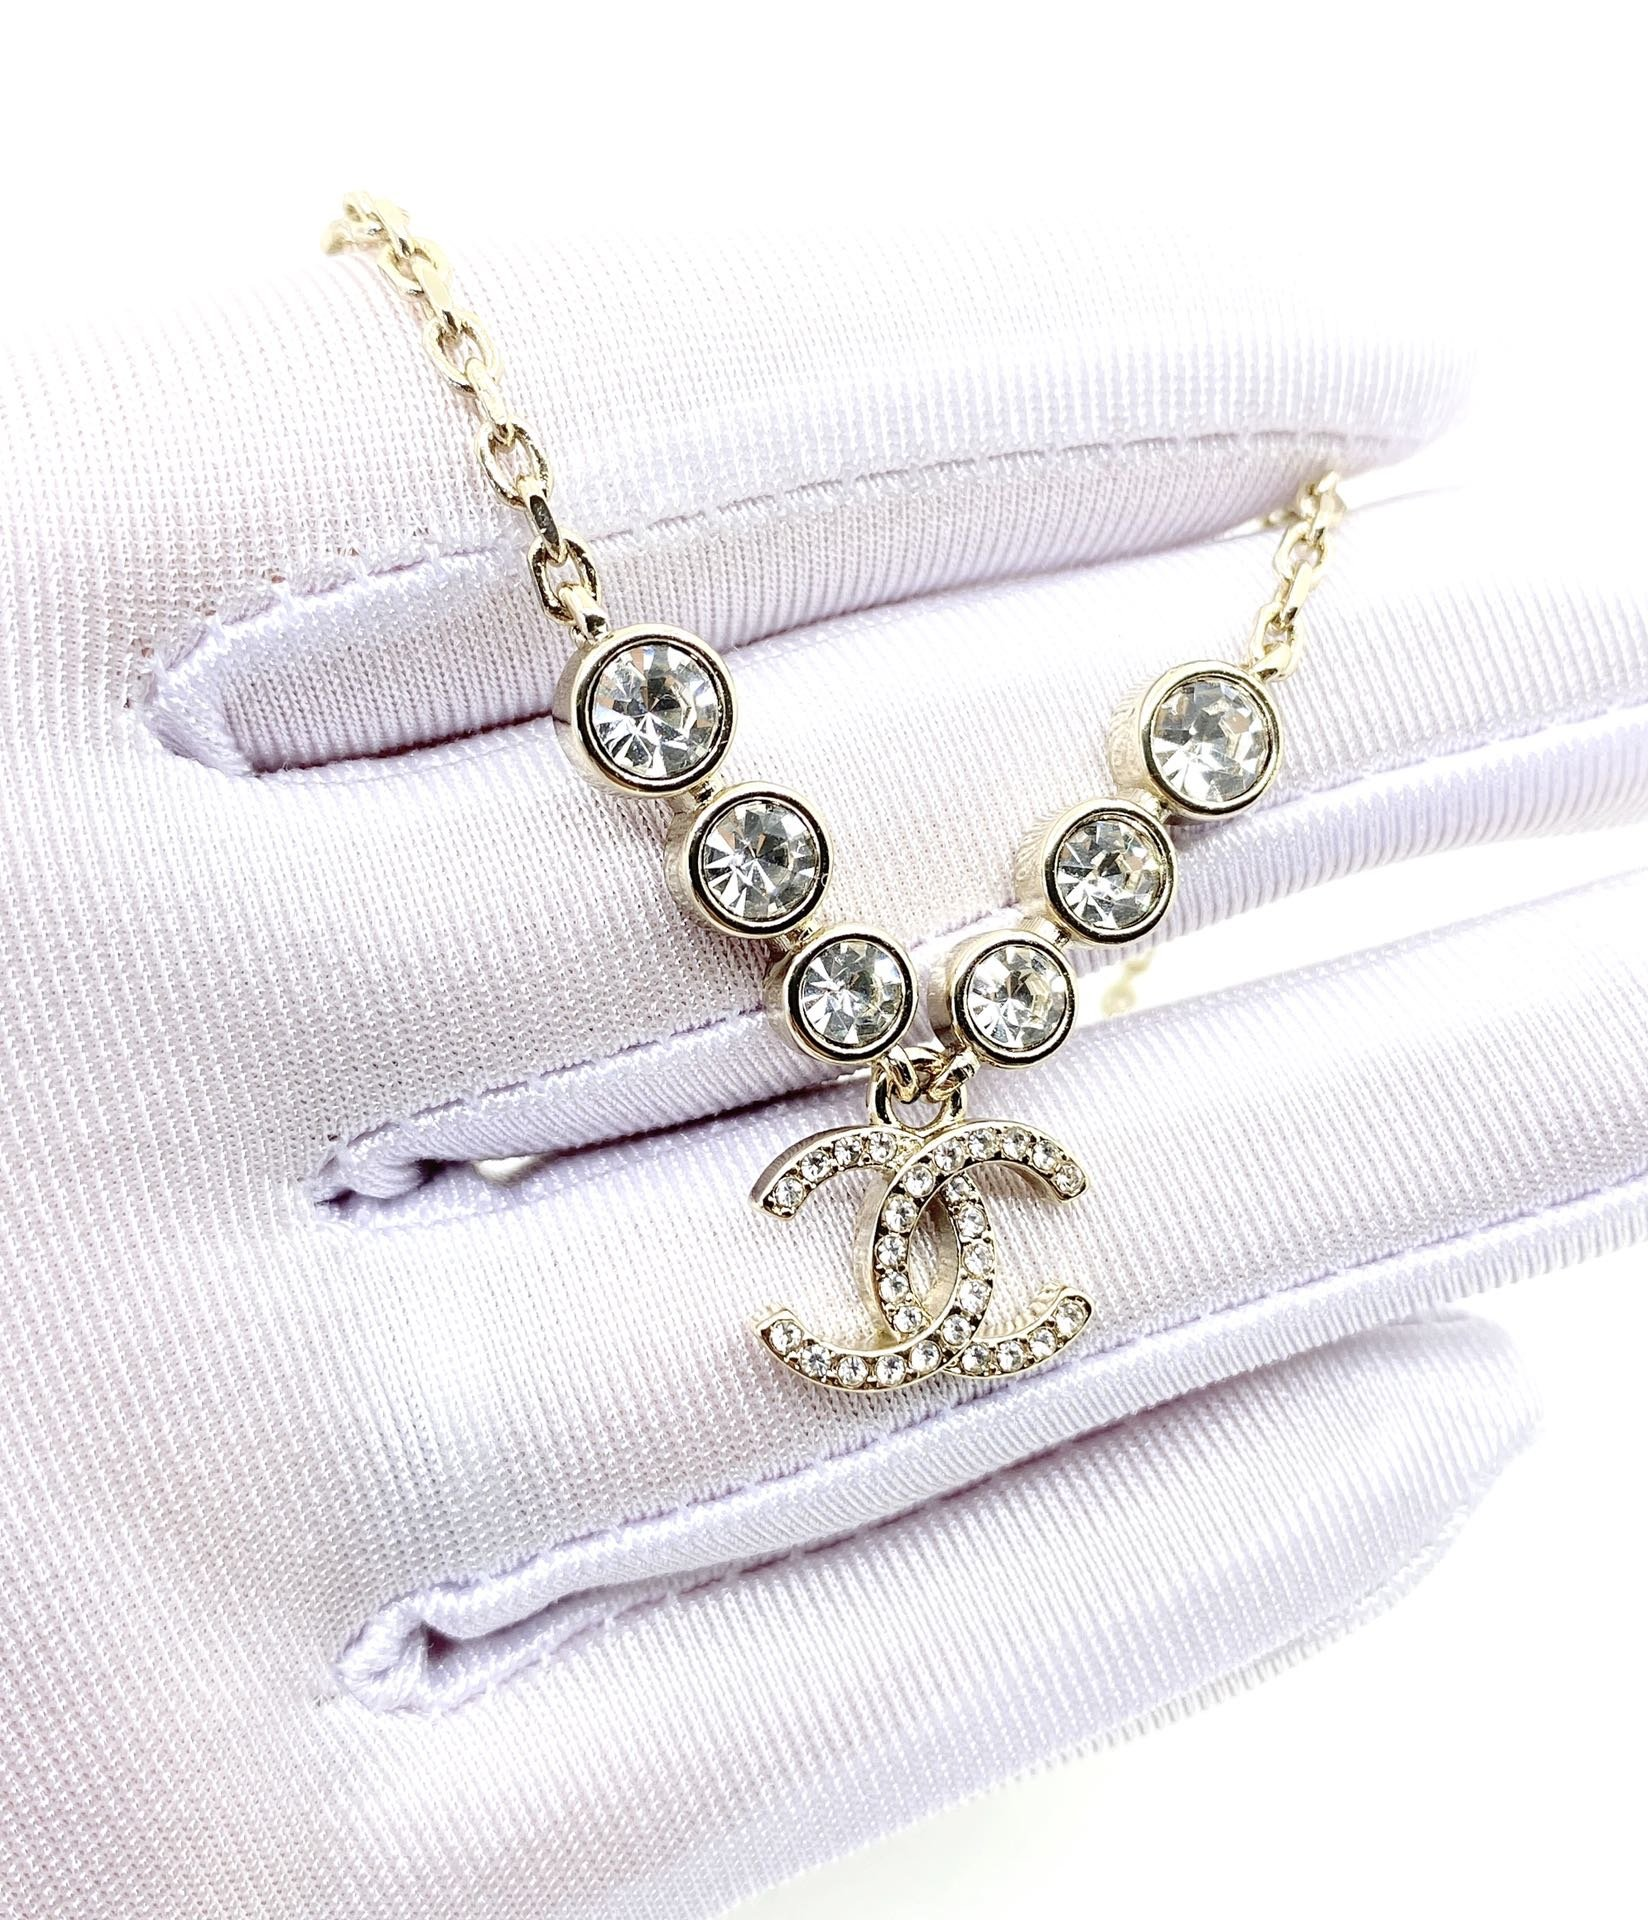 Chanel最新款钻项链一致zP黄铜